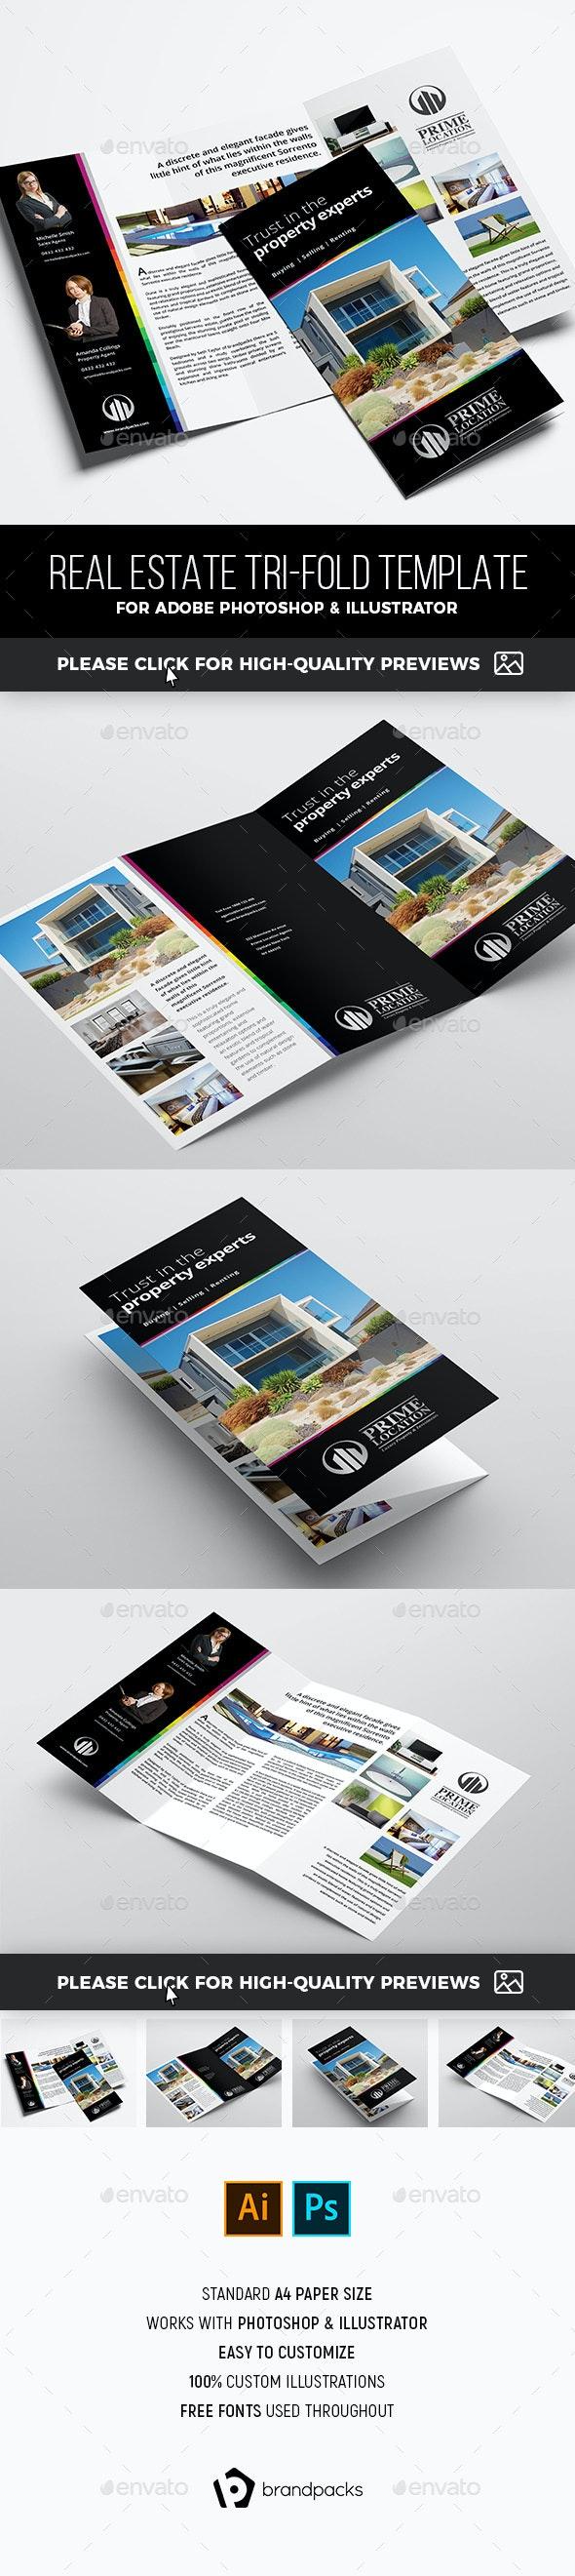 Real Estate Tri-Fold Brochure Template - Corporate Brochures